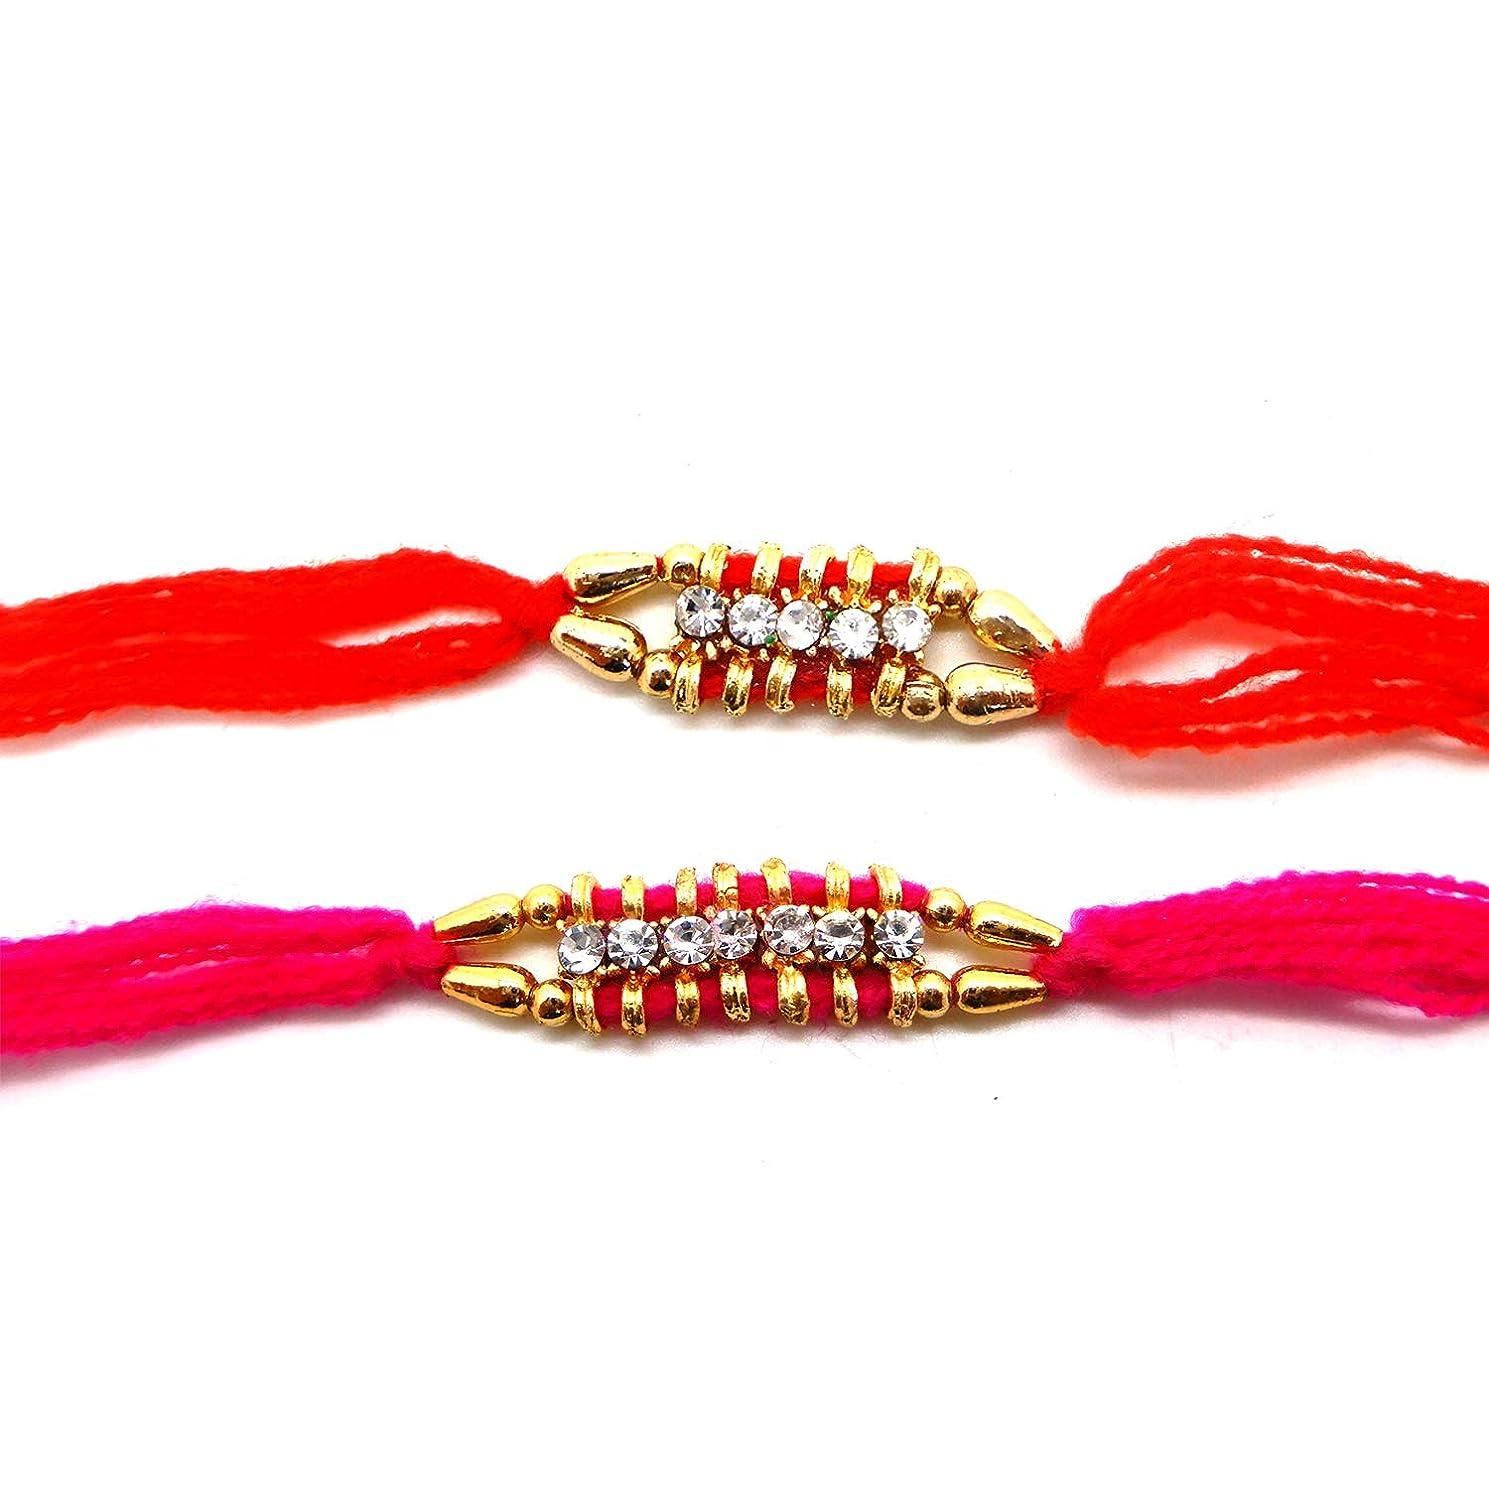 WhopperIndia Set of Two Rakhi, Five Stone Rakhi Thread, Raksha bandhan Gift for Your Brother Color Vary and Multi Design